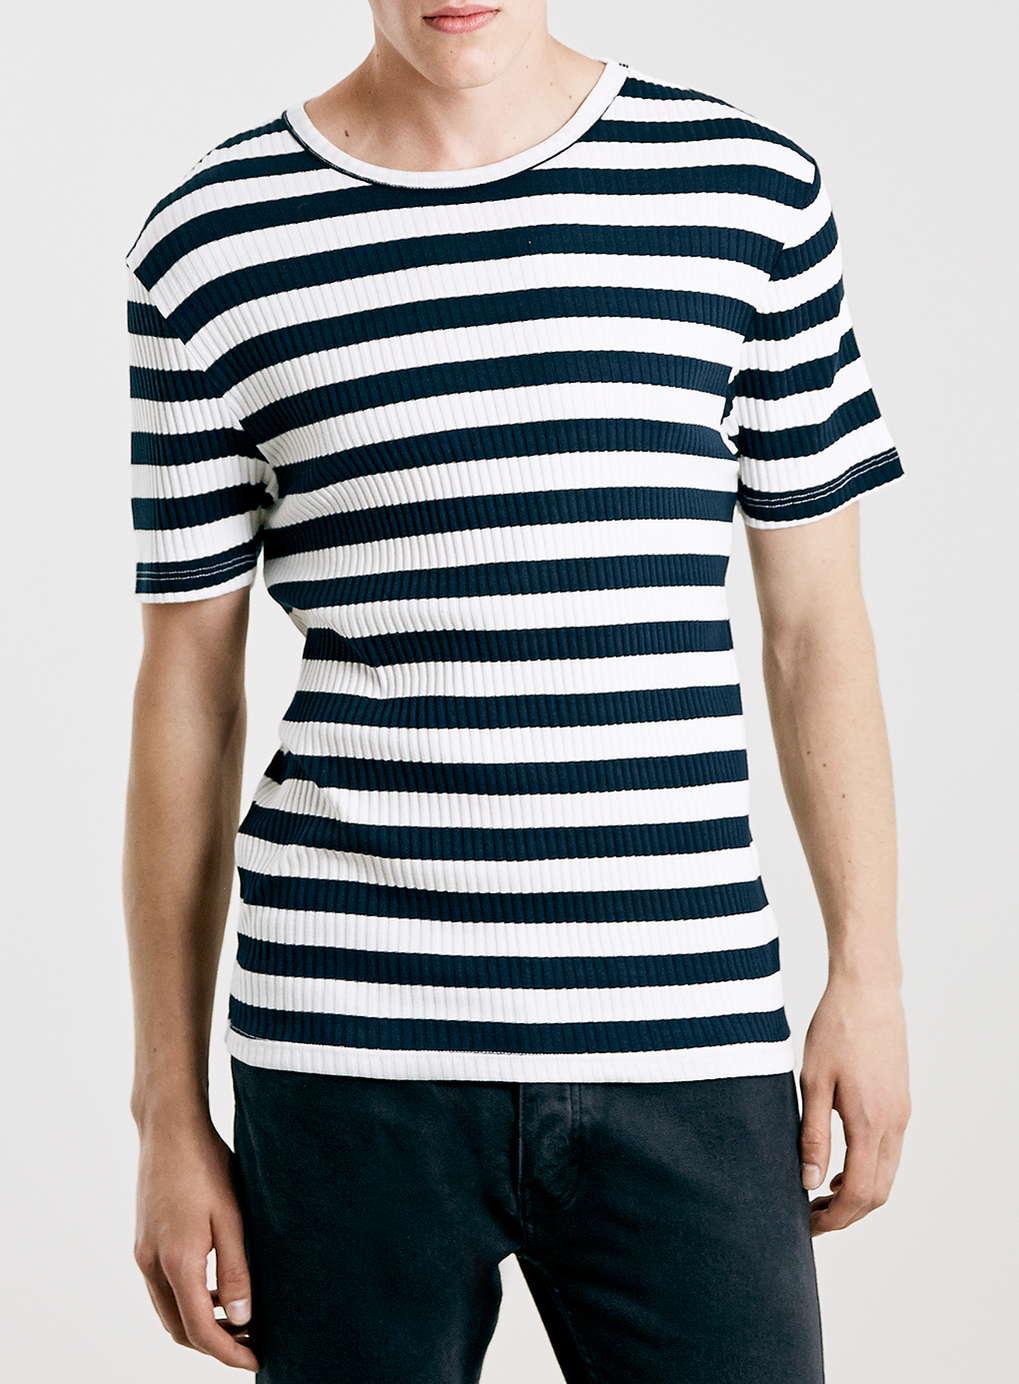 Topman Ecru And Navy Striped T Shirt In Beige For Men